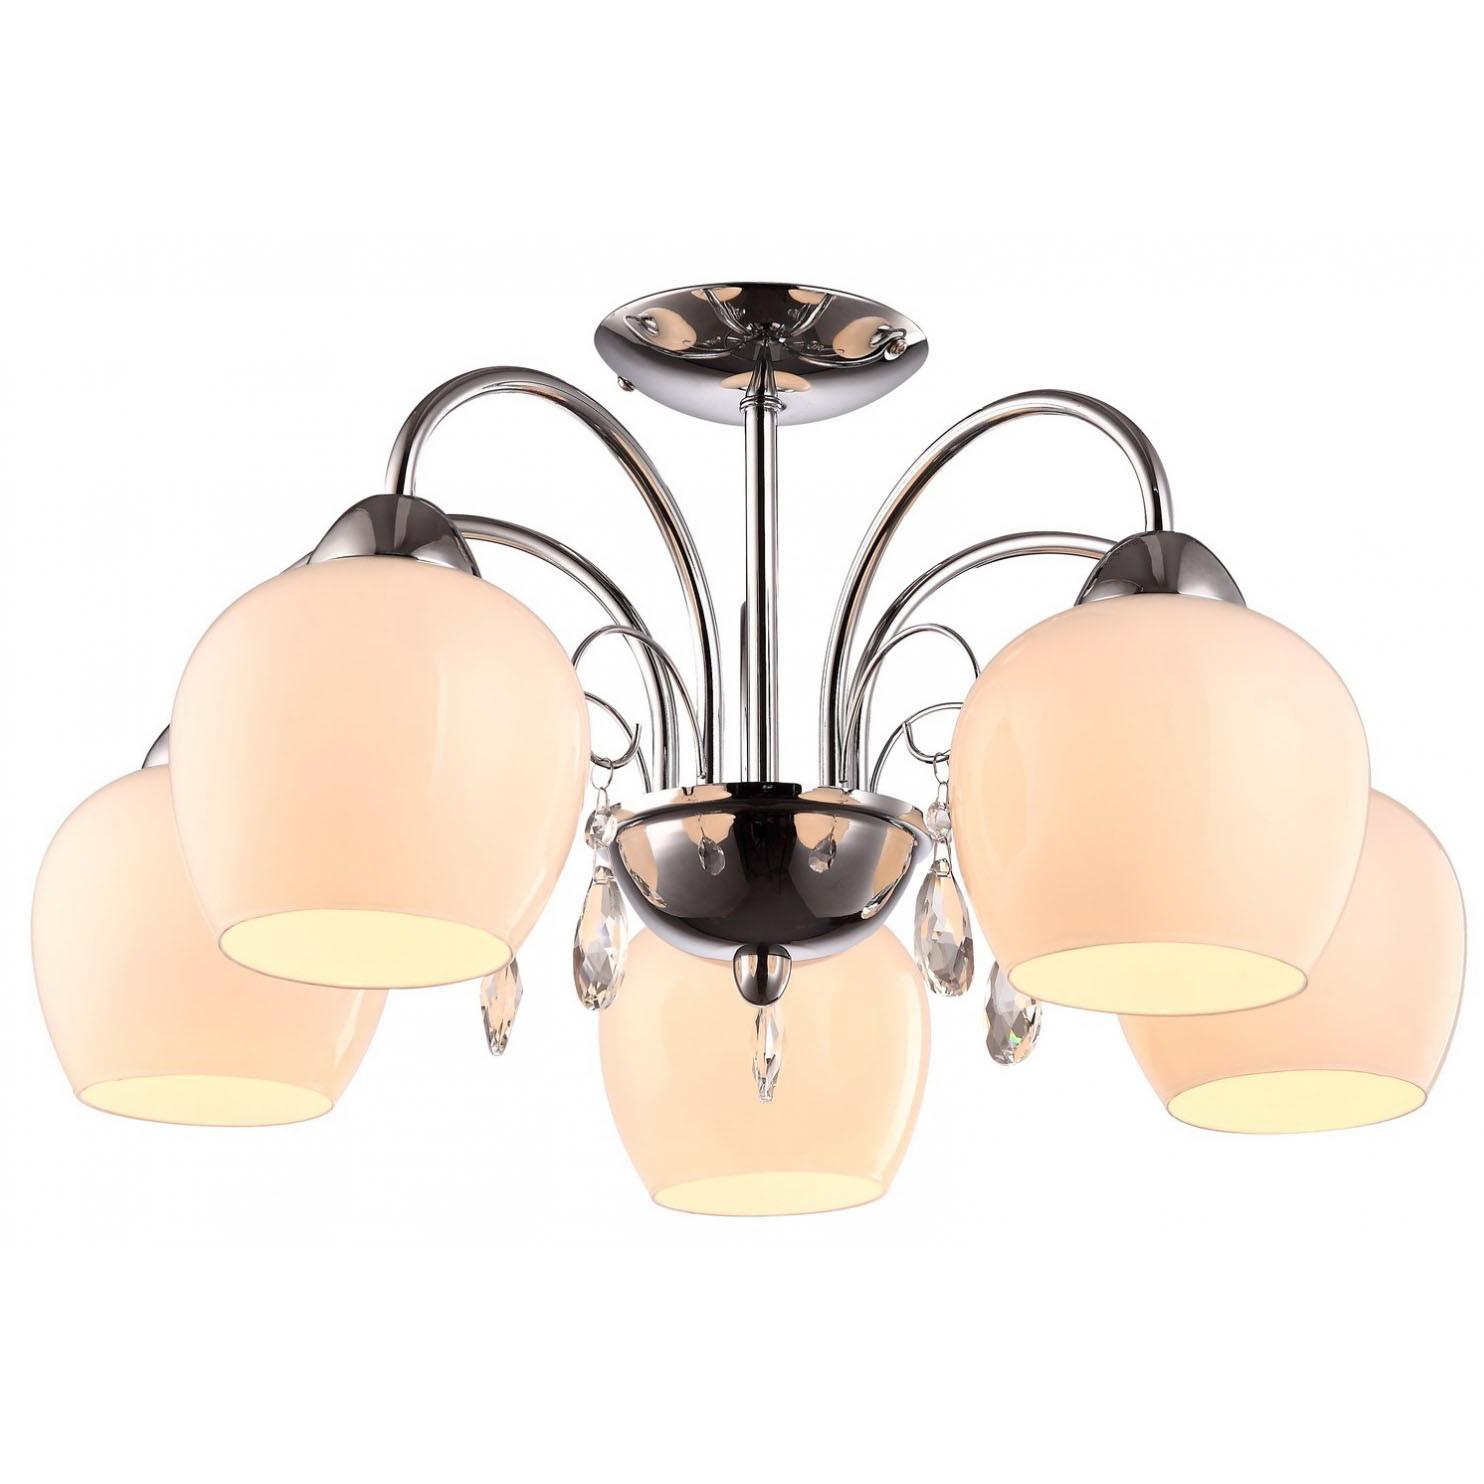 Люстра Arte lamp Millo a9548pl-5cc arte lamp потолочная люстра arte lamp millo a9548pl 5cc